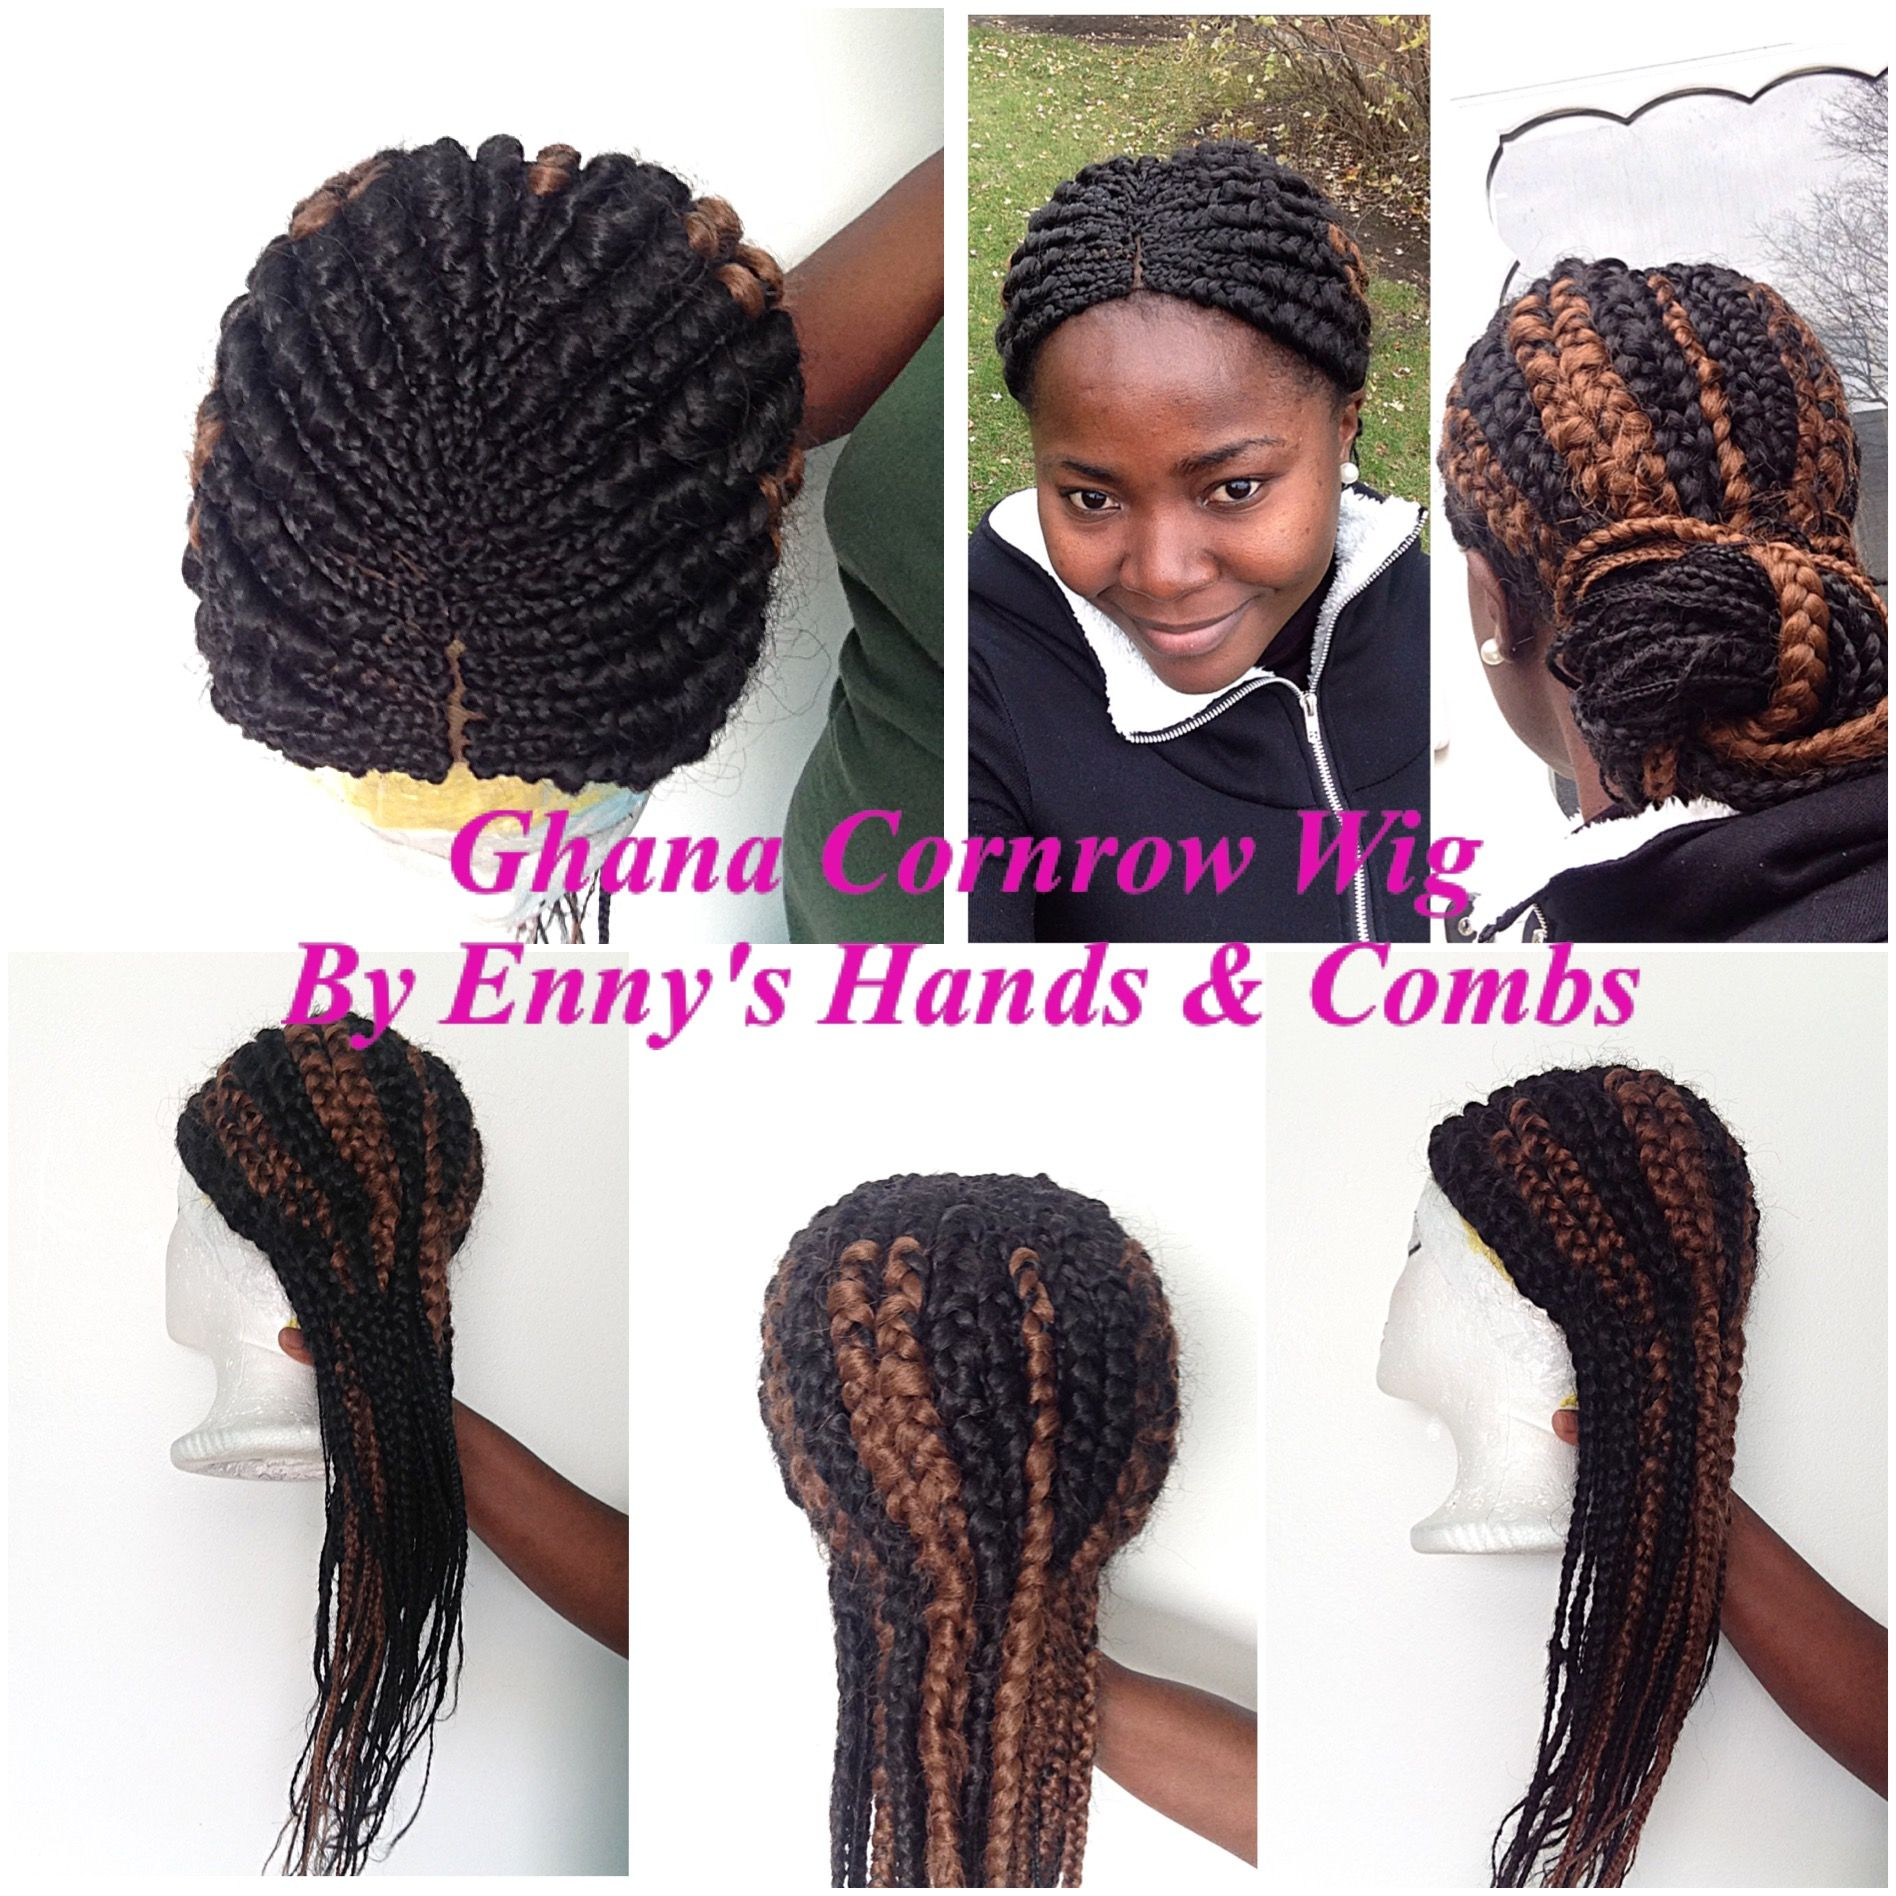 Ghana Braid Cornrow Wig By Enny S Hands Combs Ghana Braids Wigs Braids